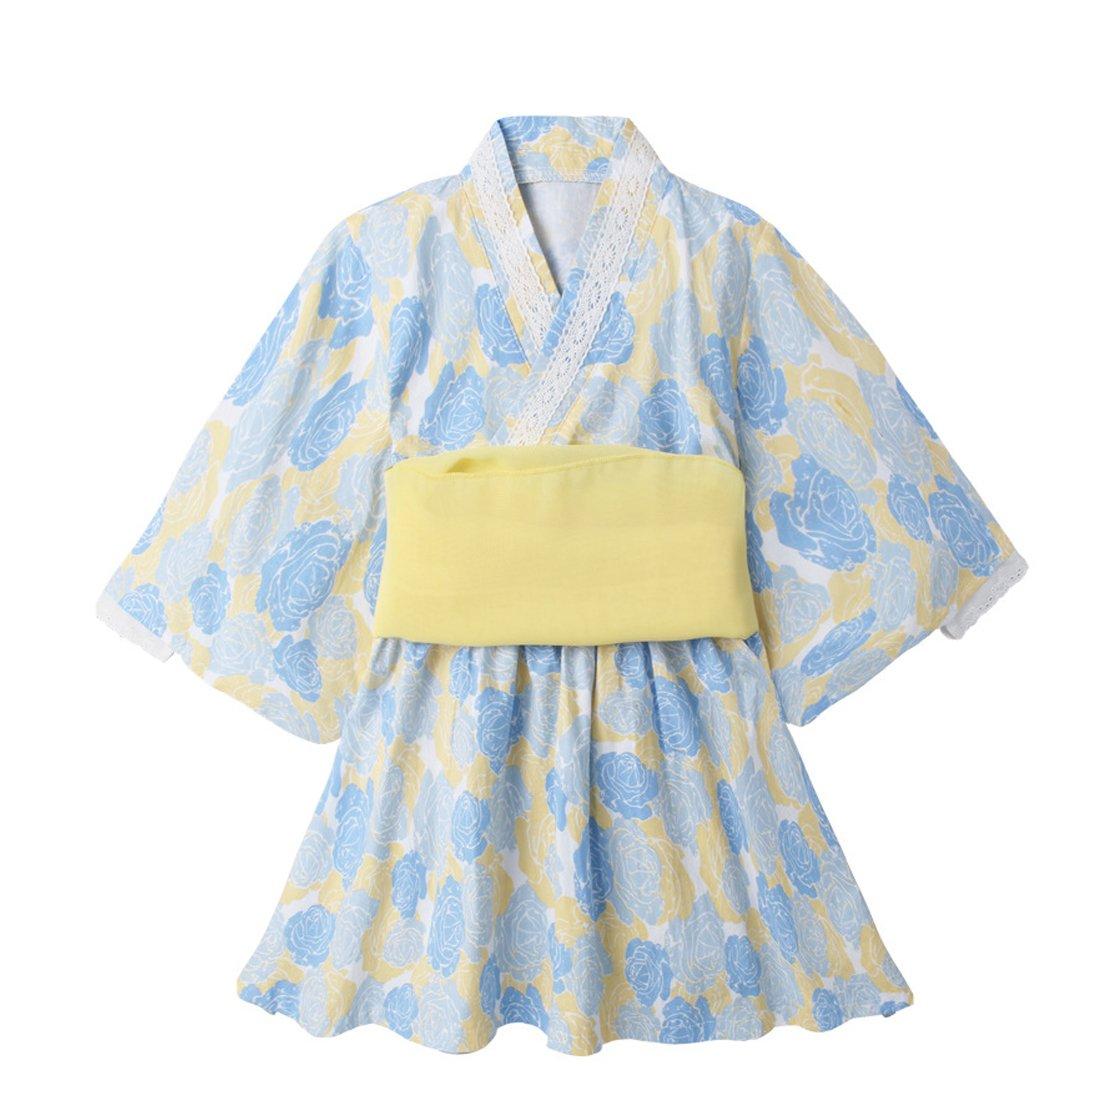 dffe4cf32d7b5 Baby Girl Kimono Robe Dress Organic Cotton Japan Yukata with Belt for 1-7  years